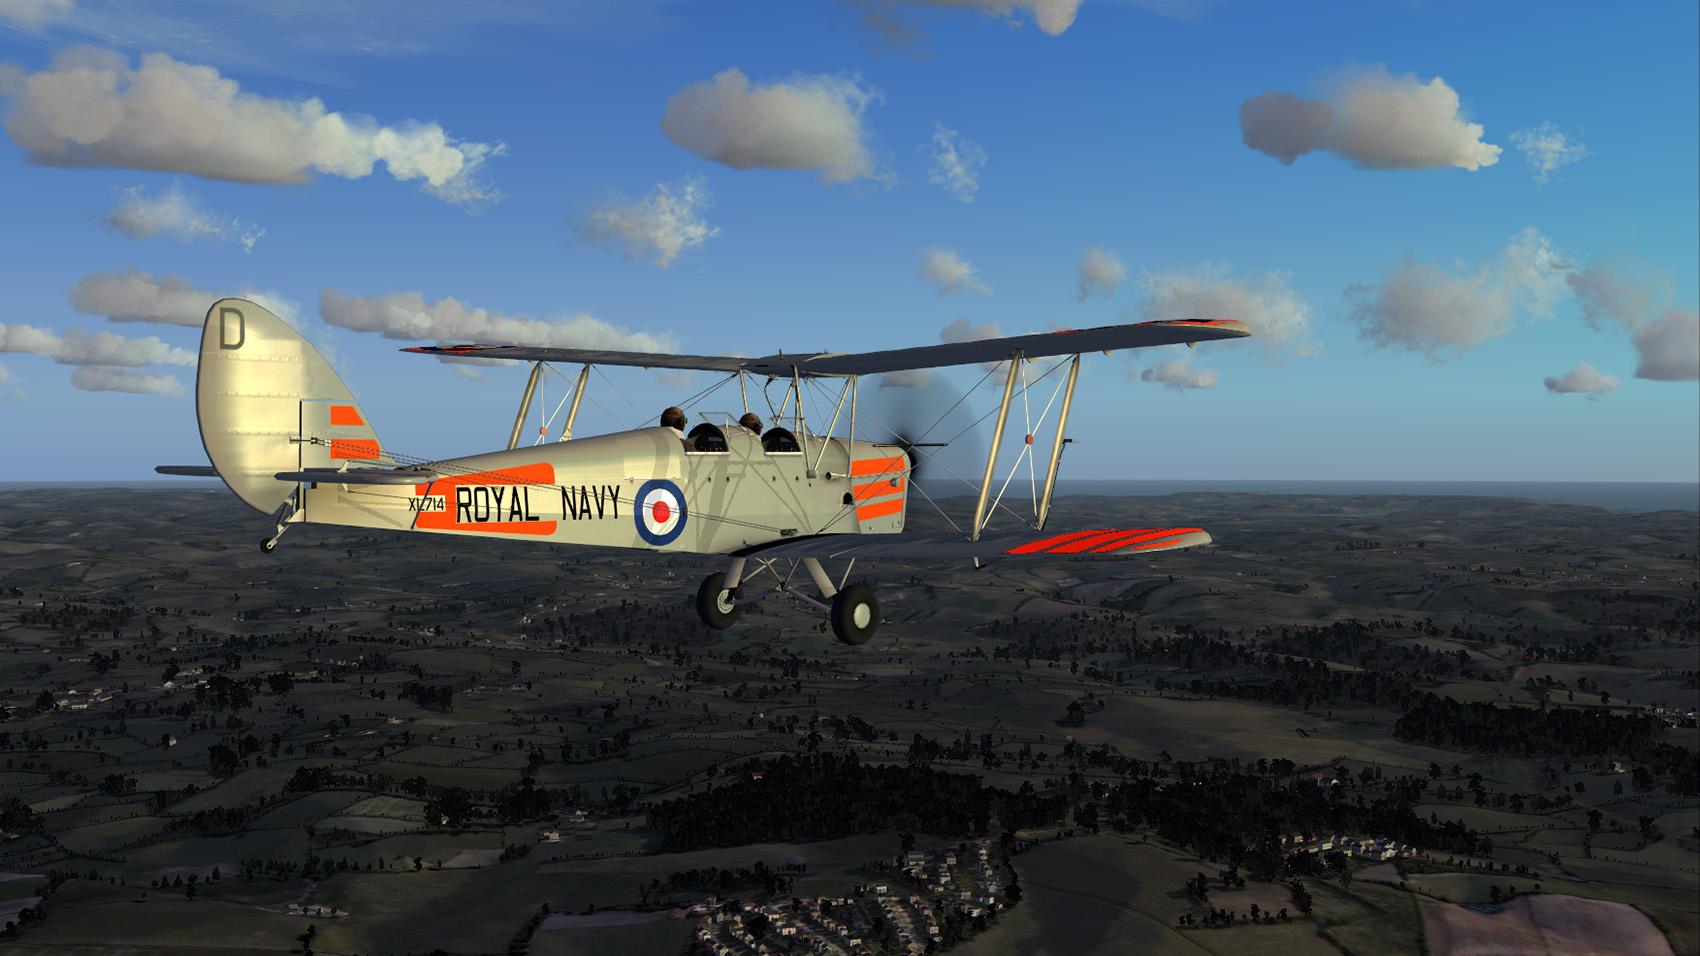 FSX Fleet Air Arm Shots  - Community Screenshots - Orbx Community